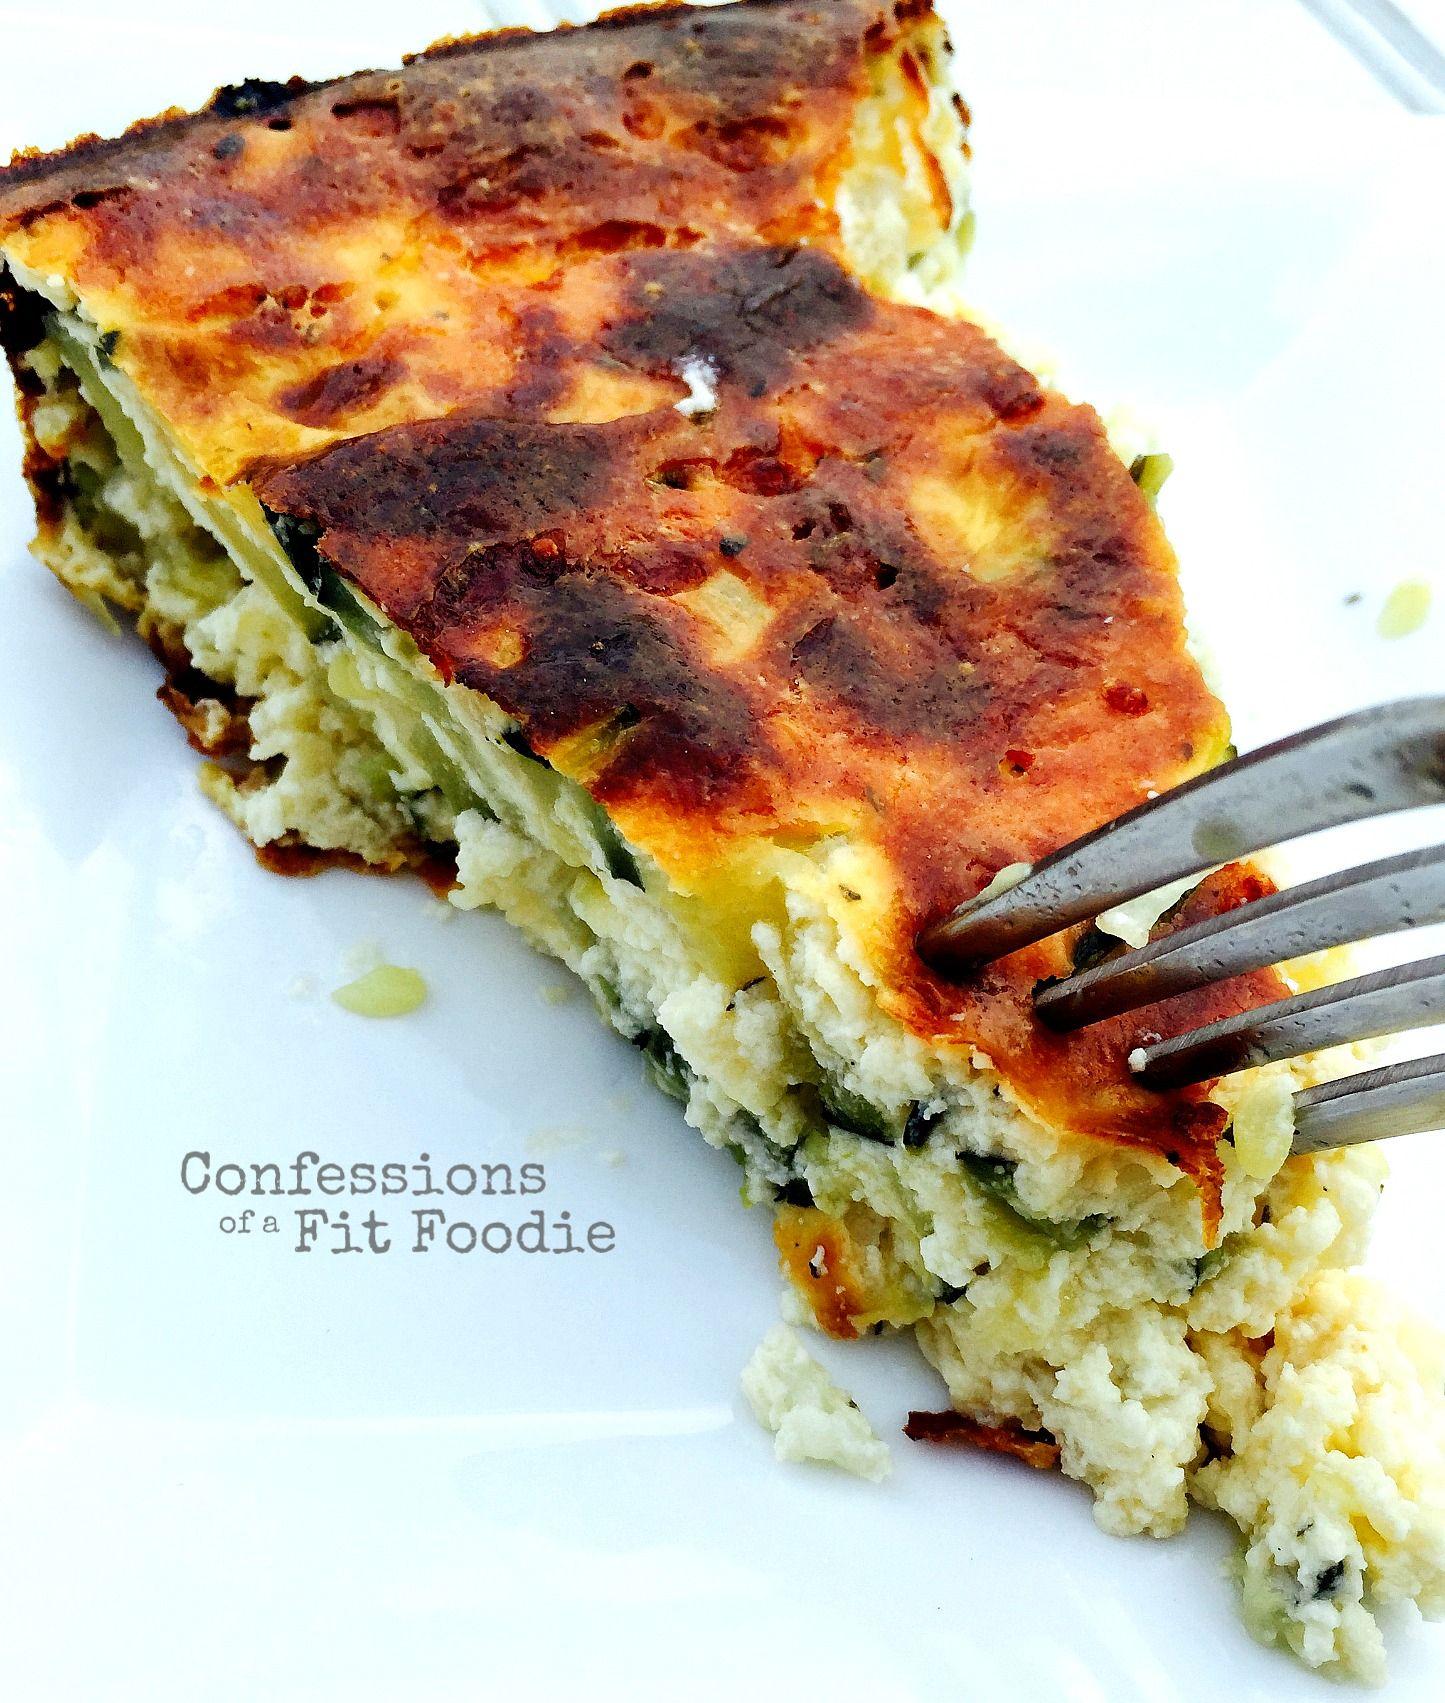 Crustless Zucchini Pie 21 Day Fix Breakfast 21 Day Fix Meals Recipes